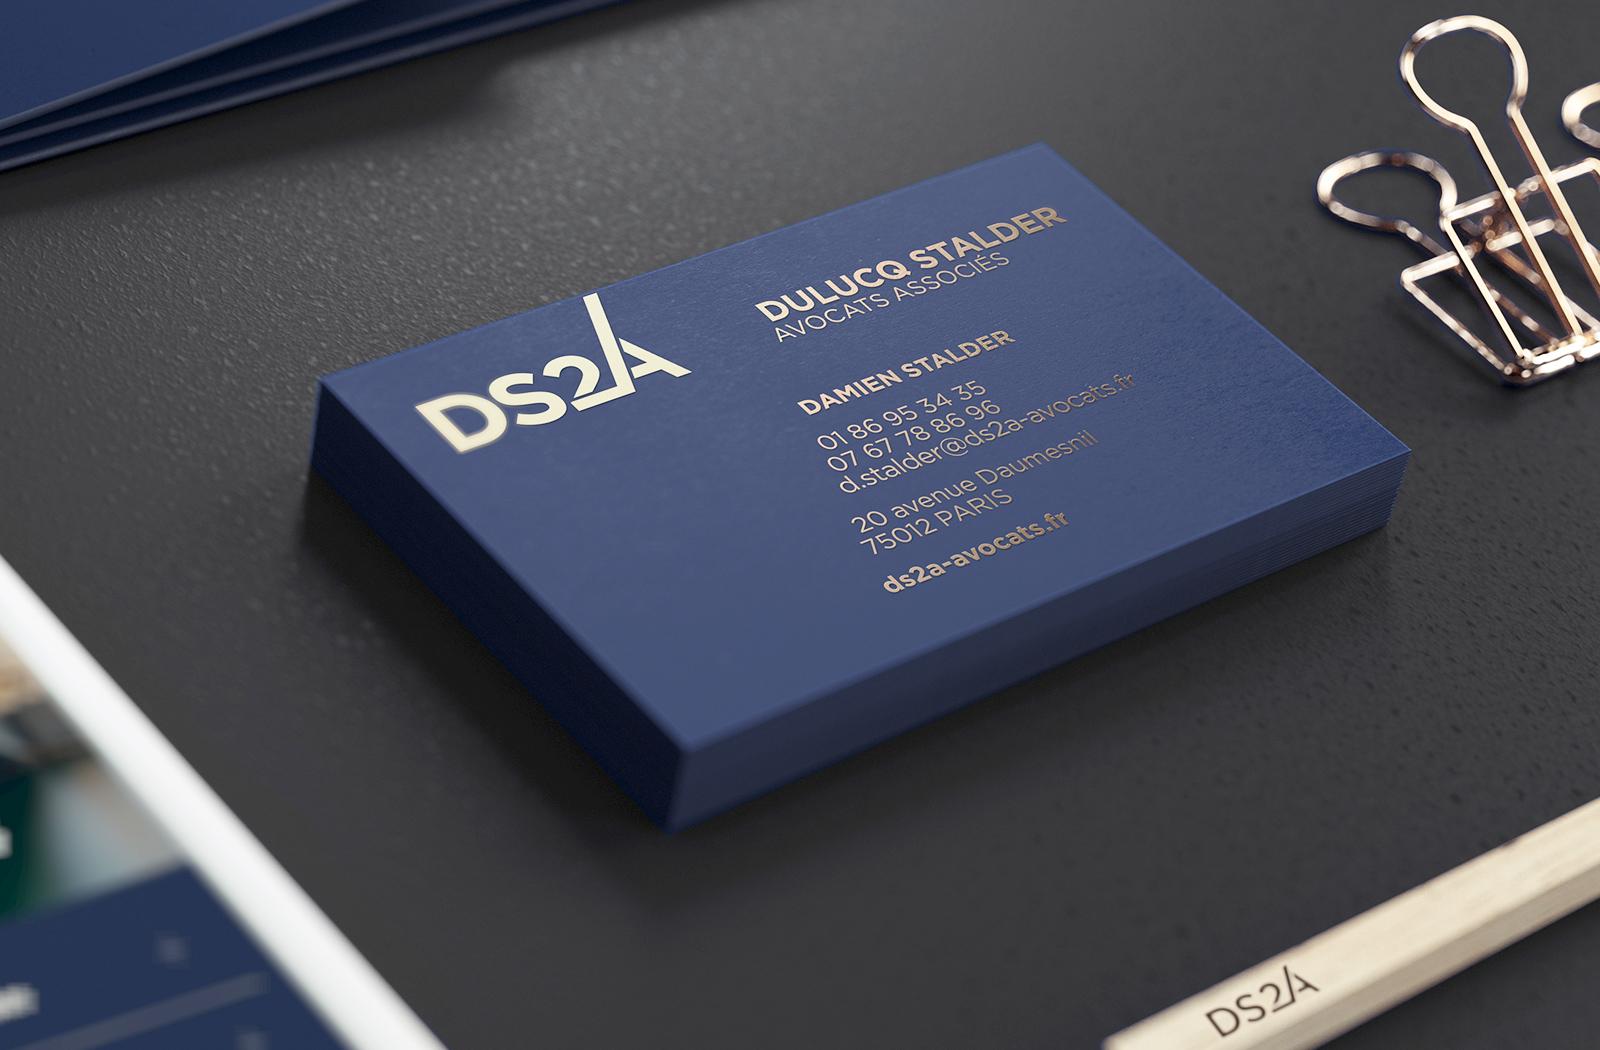 DS2A-Dulucq-stalder-avocats-branding-josselin-tourette-carte-de-visite-2